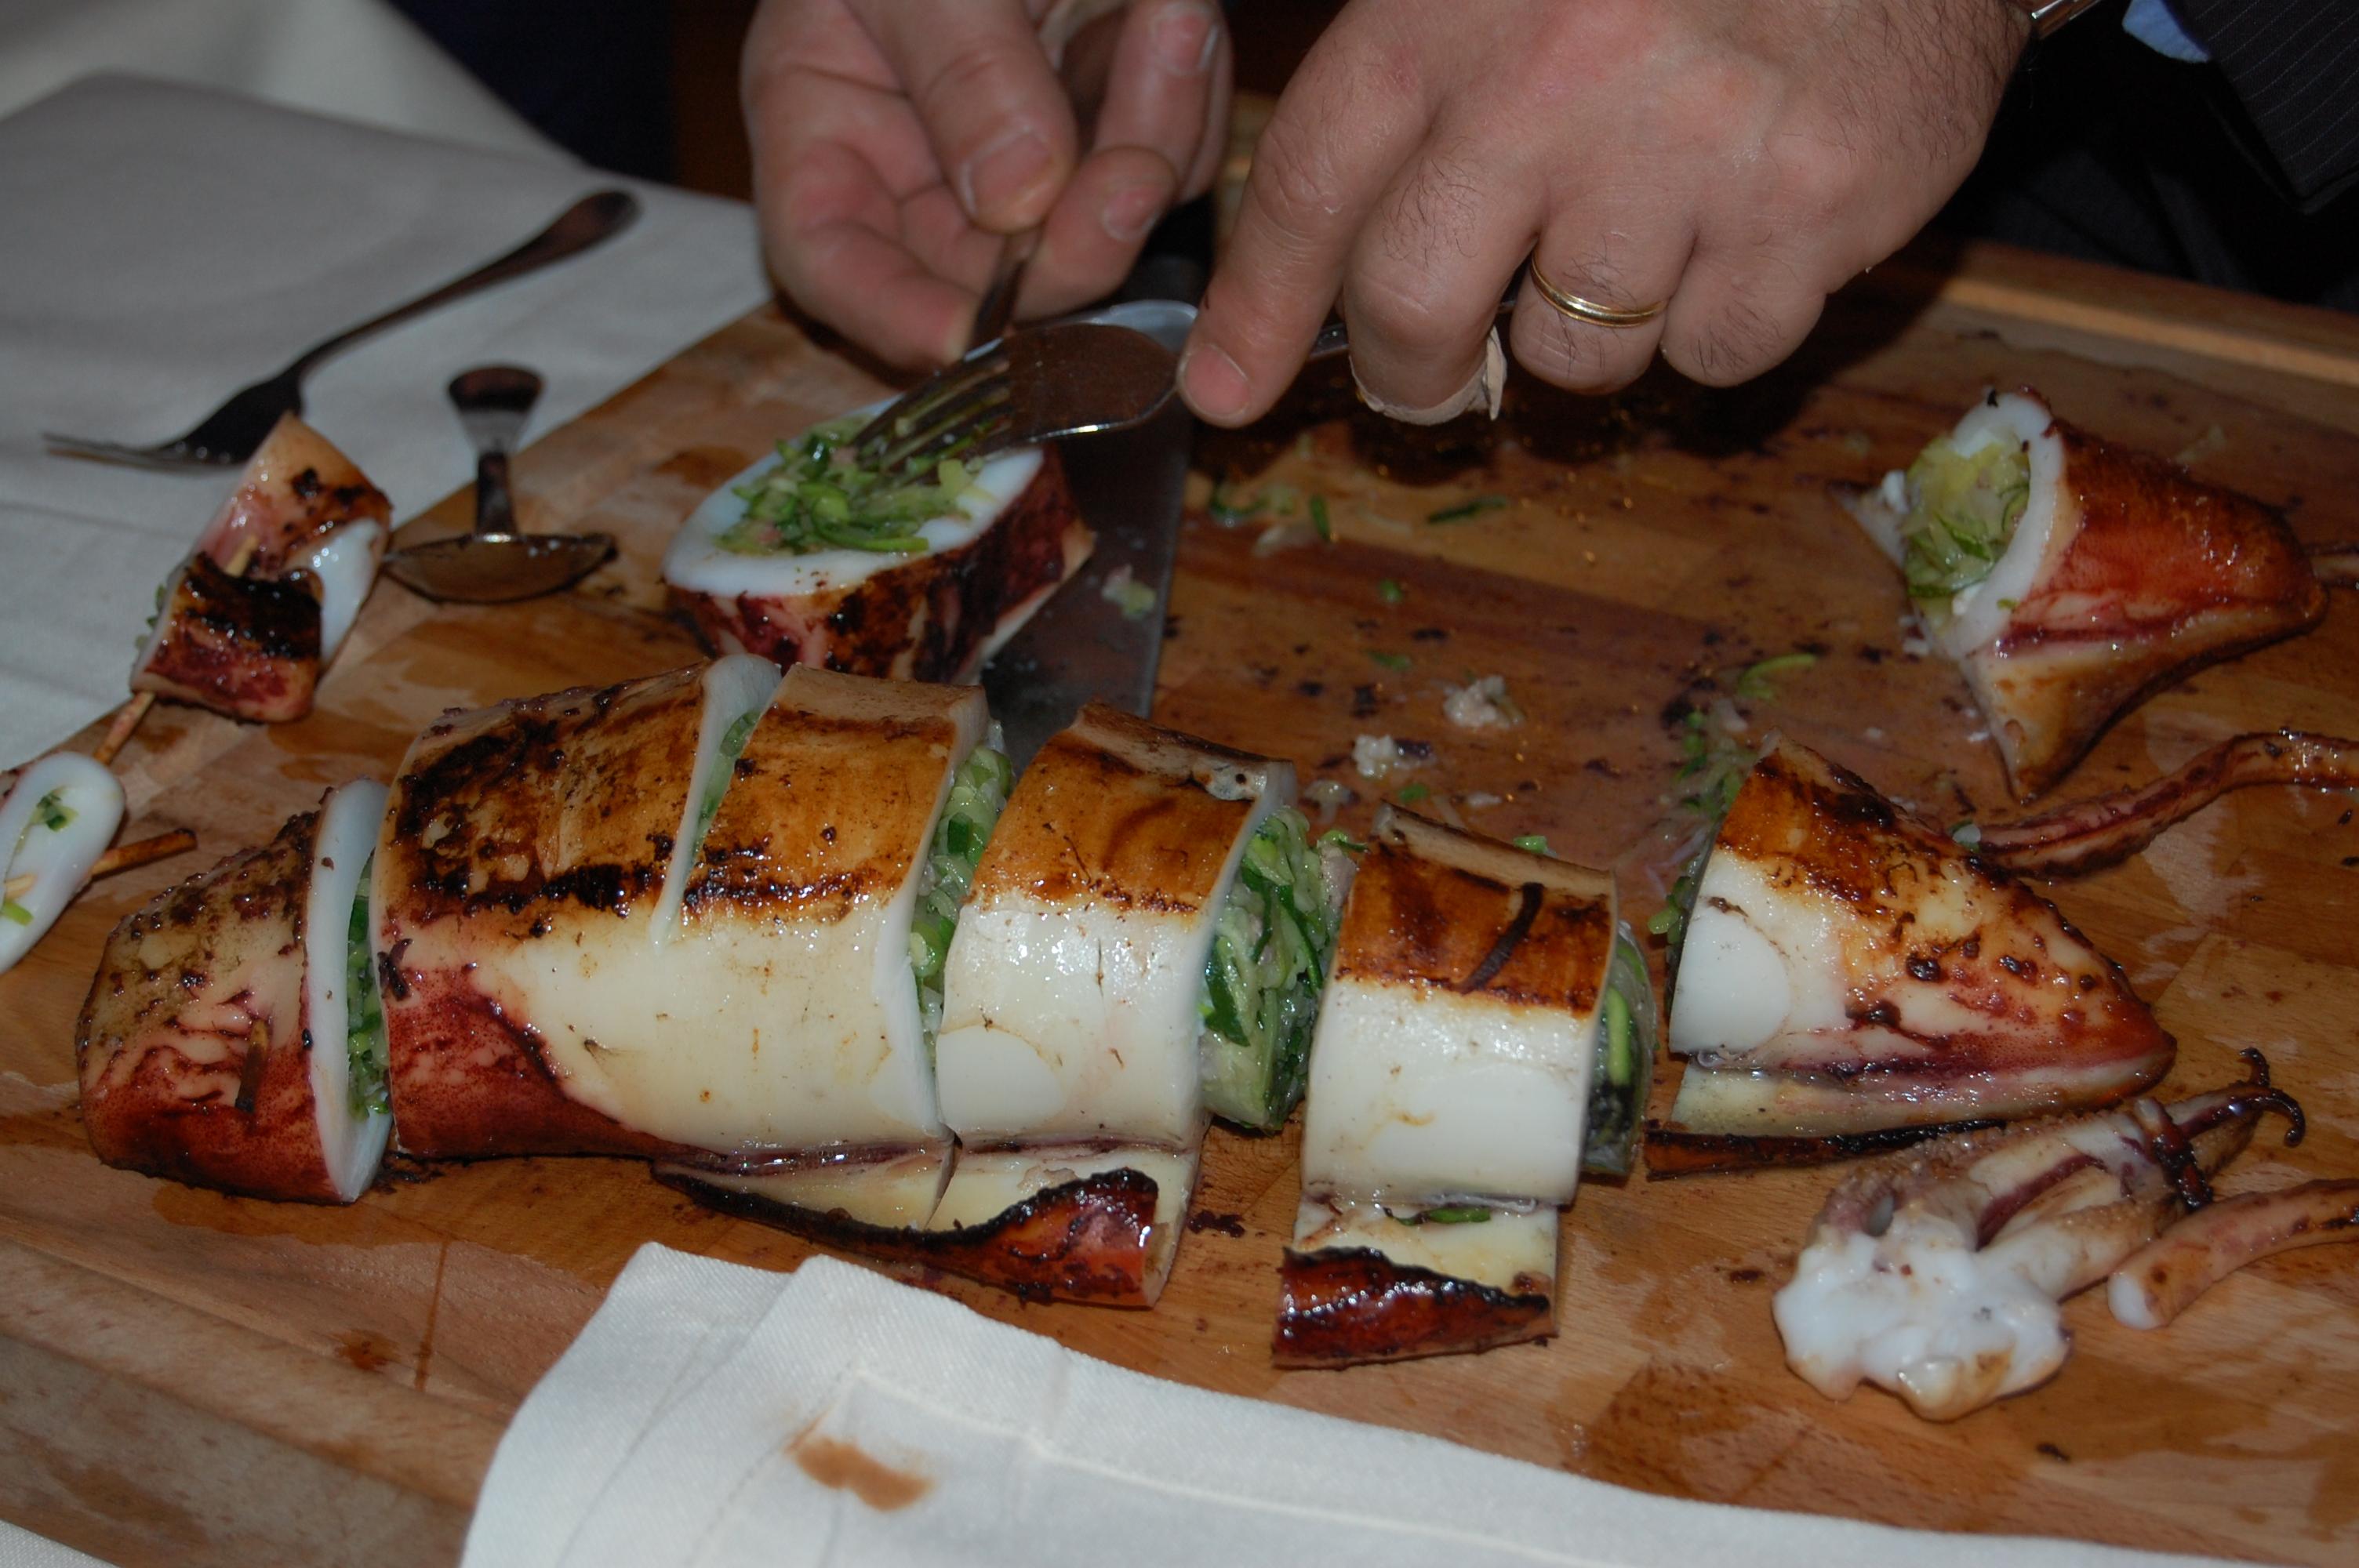 Restaurante en Huesca El gran calamar.